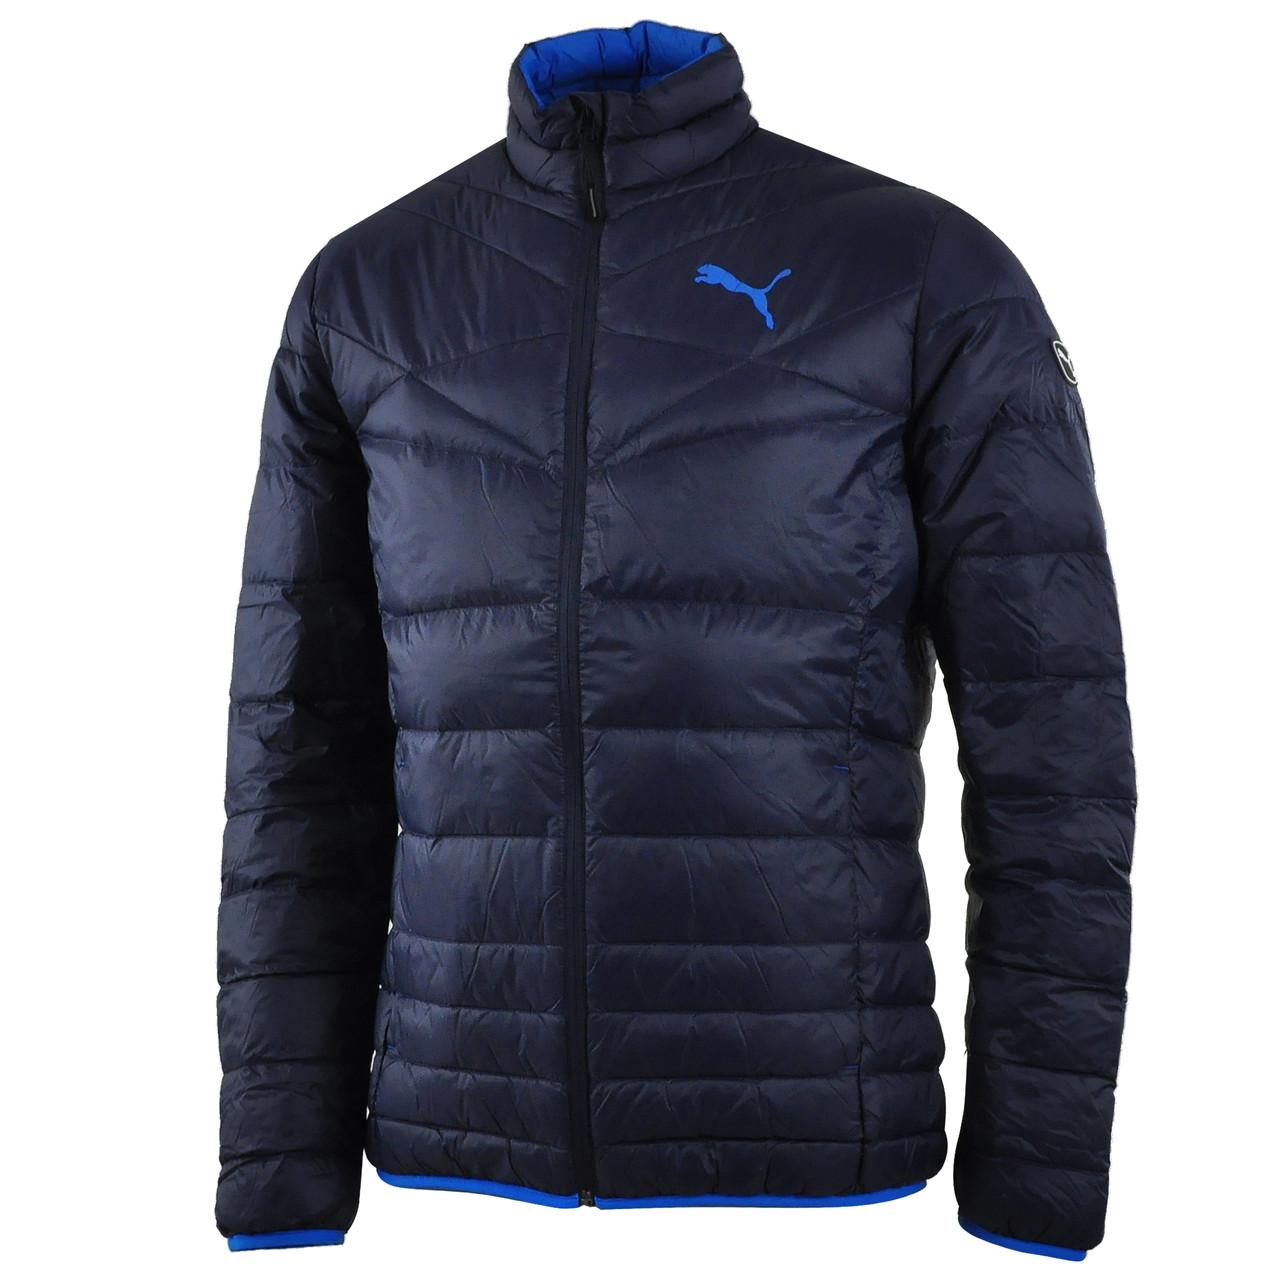 Куртка-пуховик спортивная мужская Puma Active 600 Packlite Down Jkt 838646 06 пума